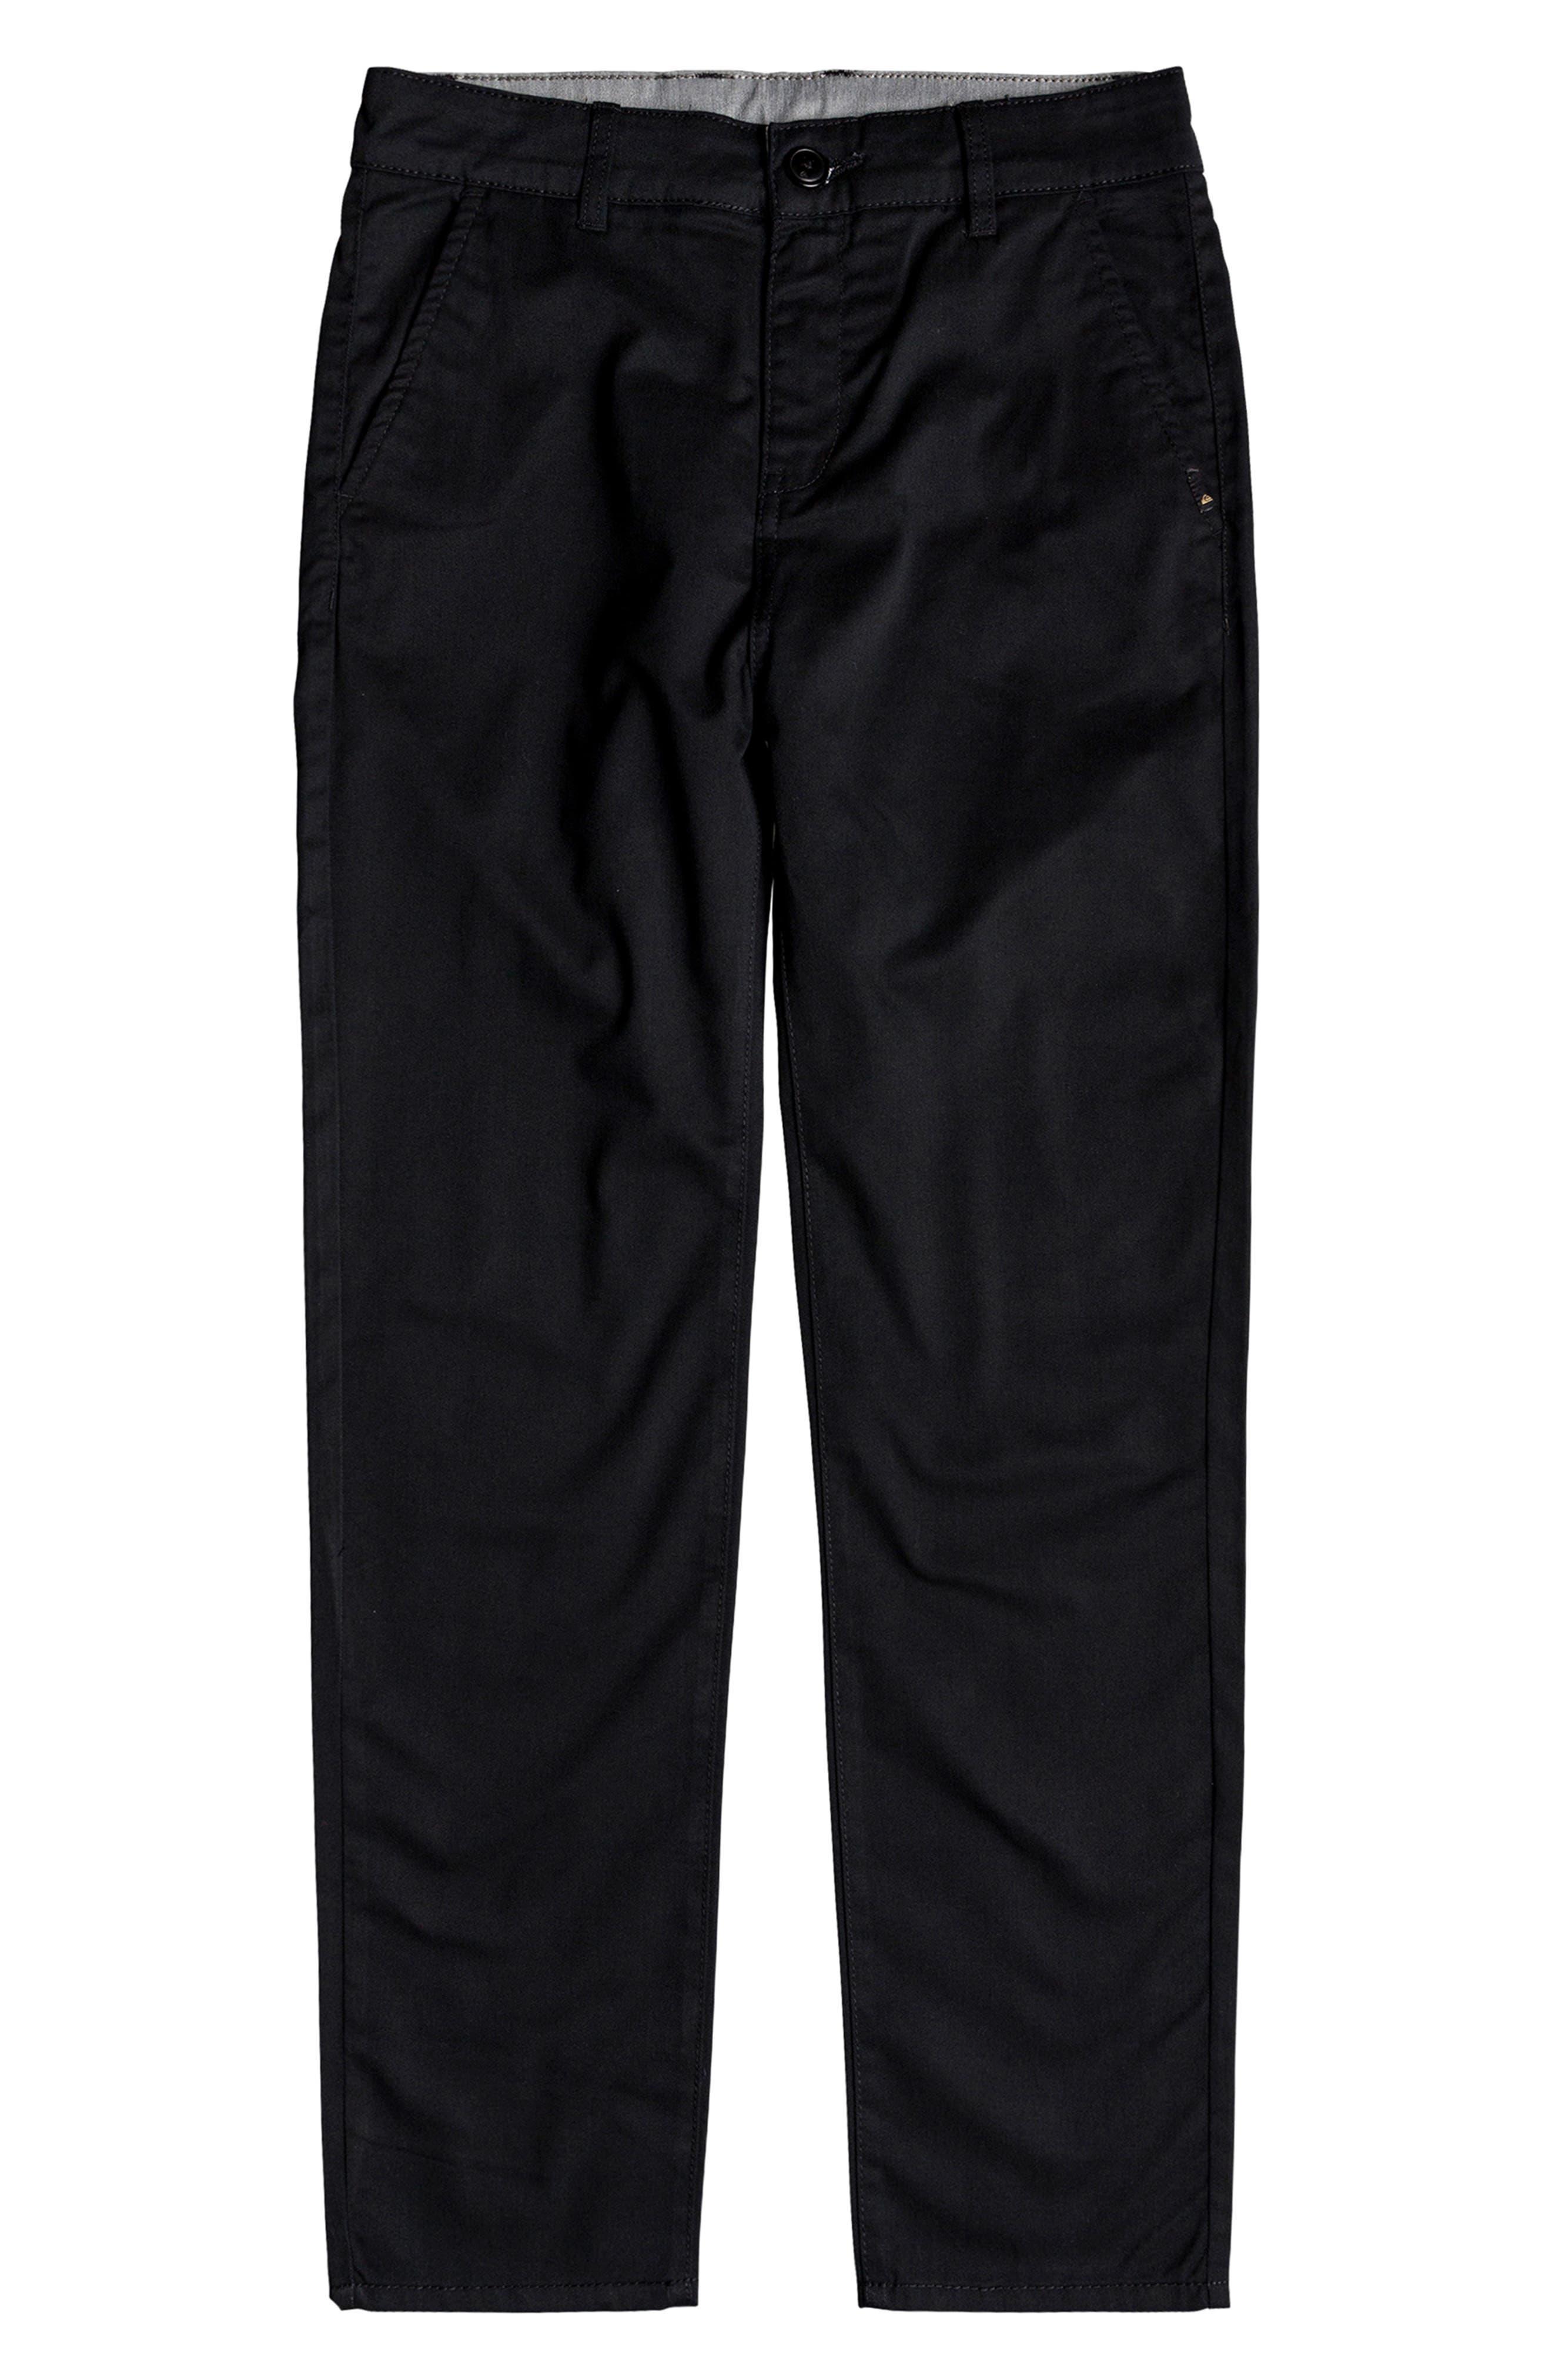 Boys Quiksilver Everyday Union Straight Leg Pants Size 23  Black